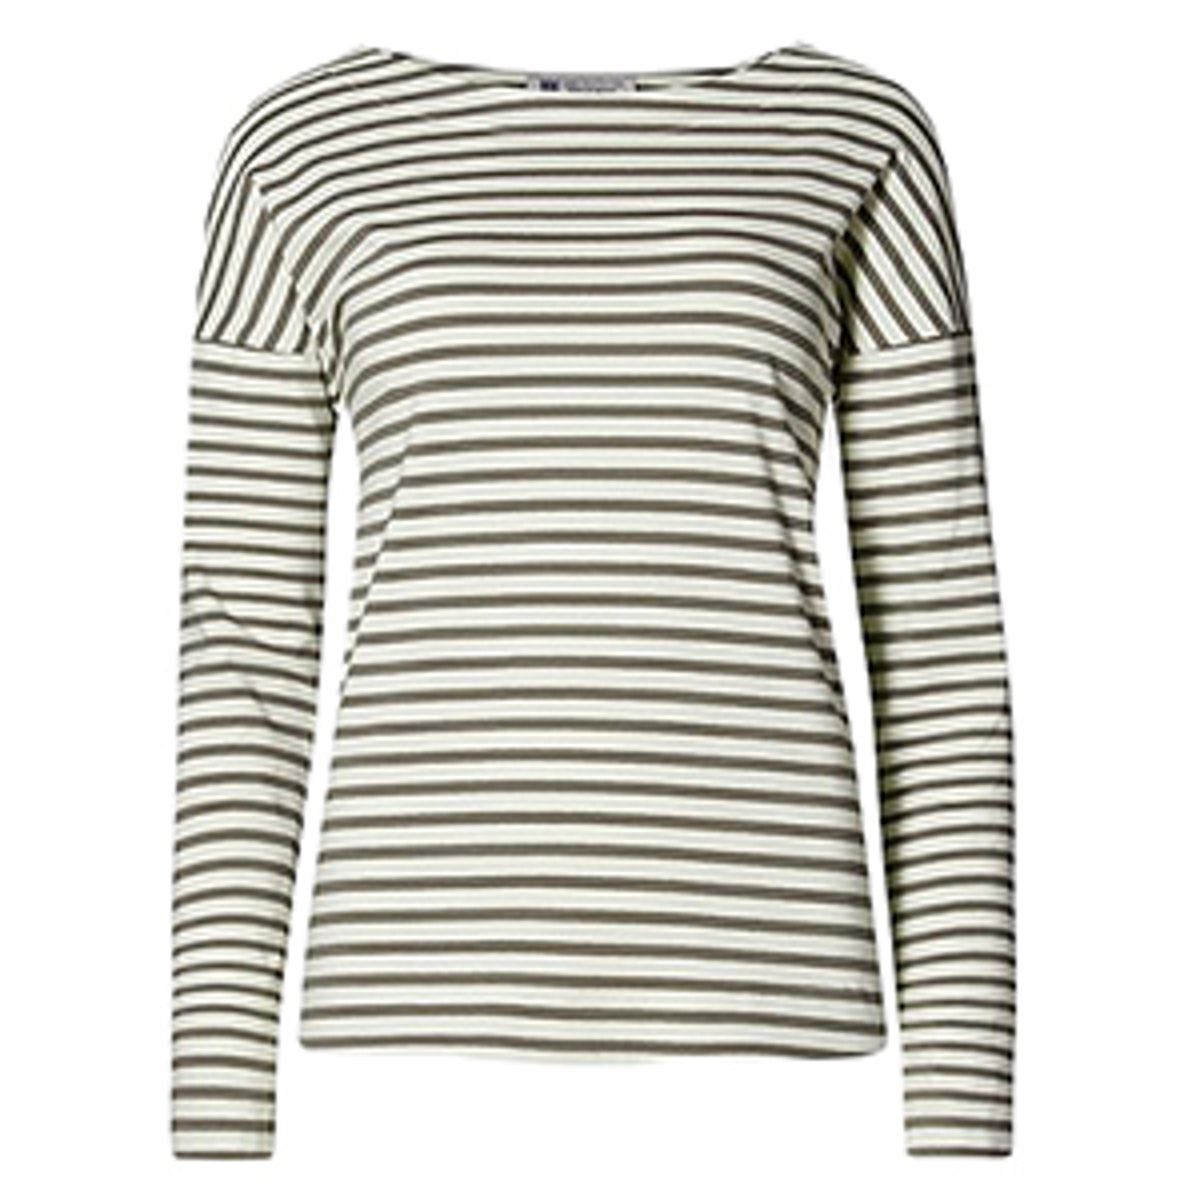 Cotton Rich Striped Top